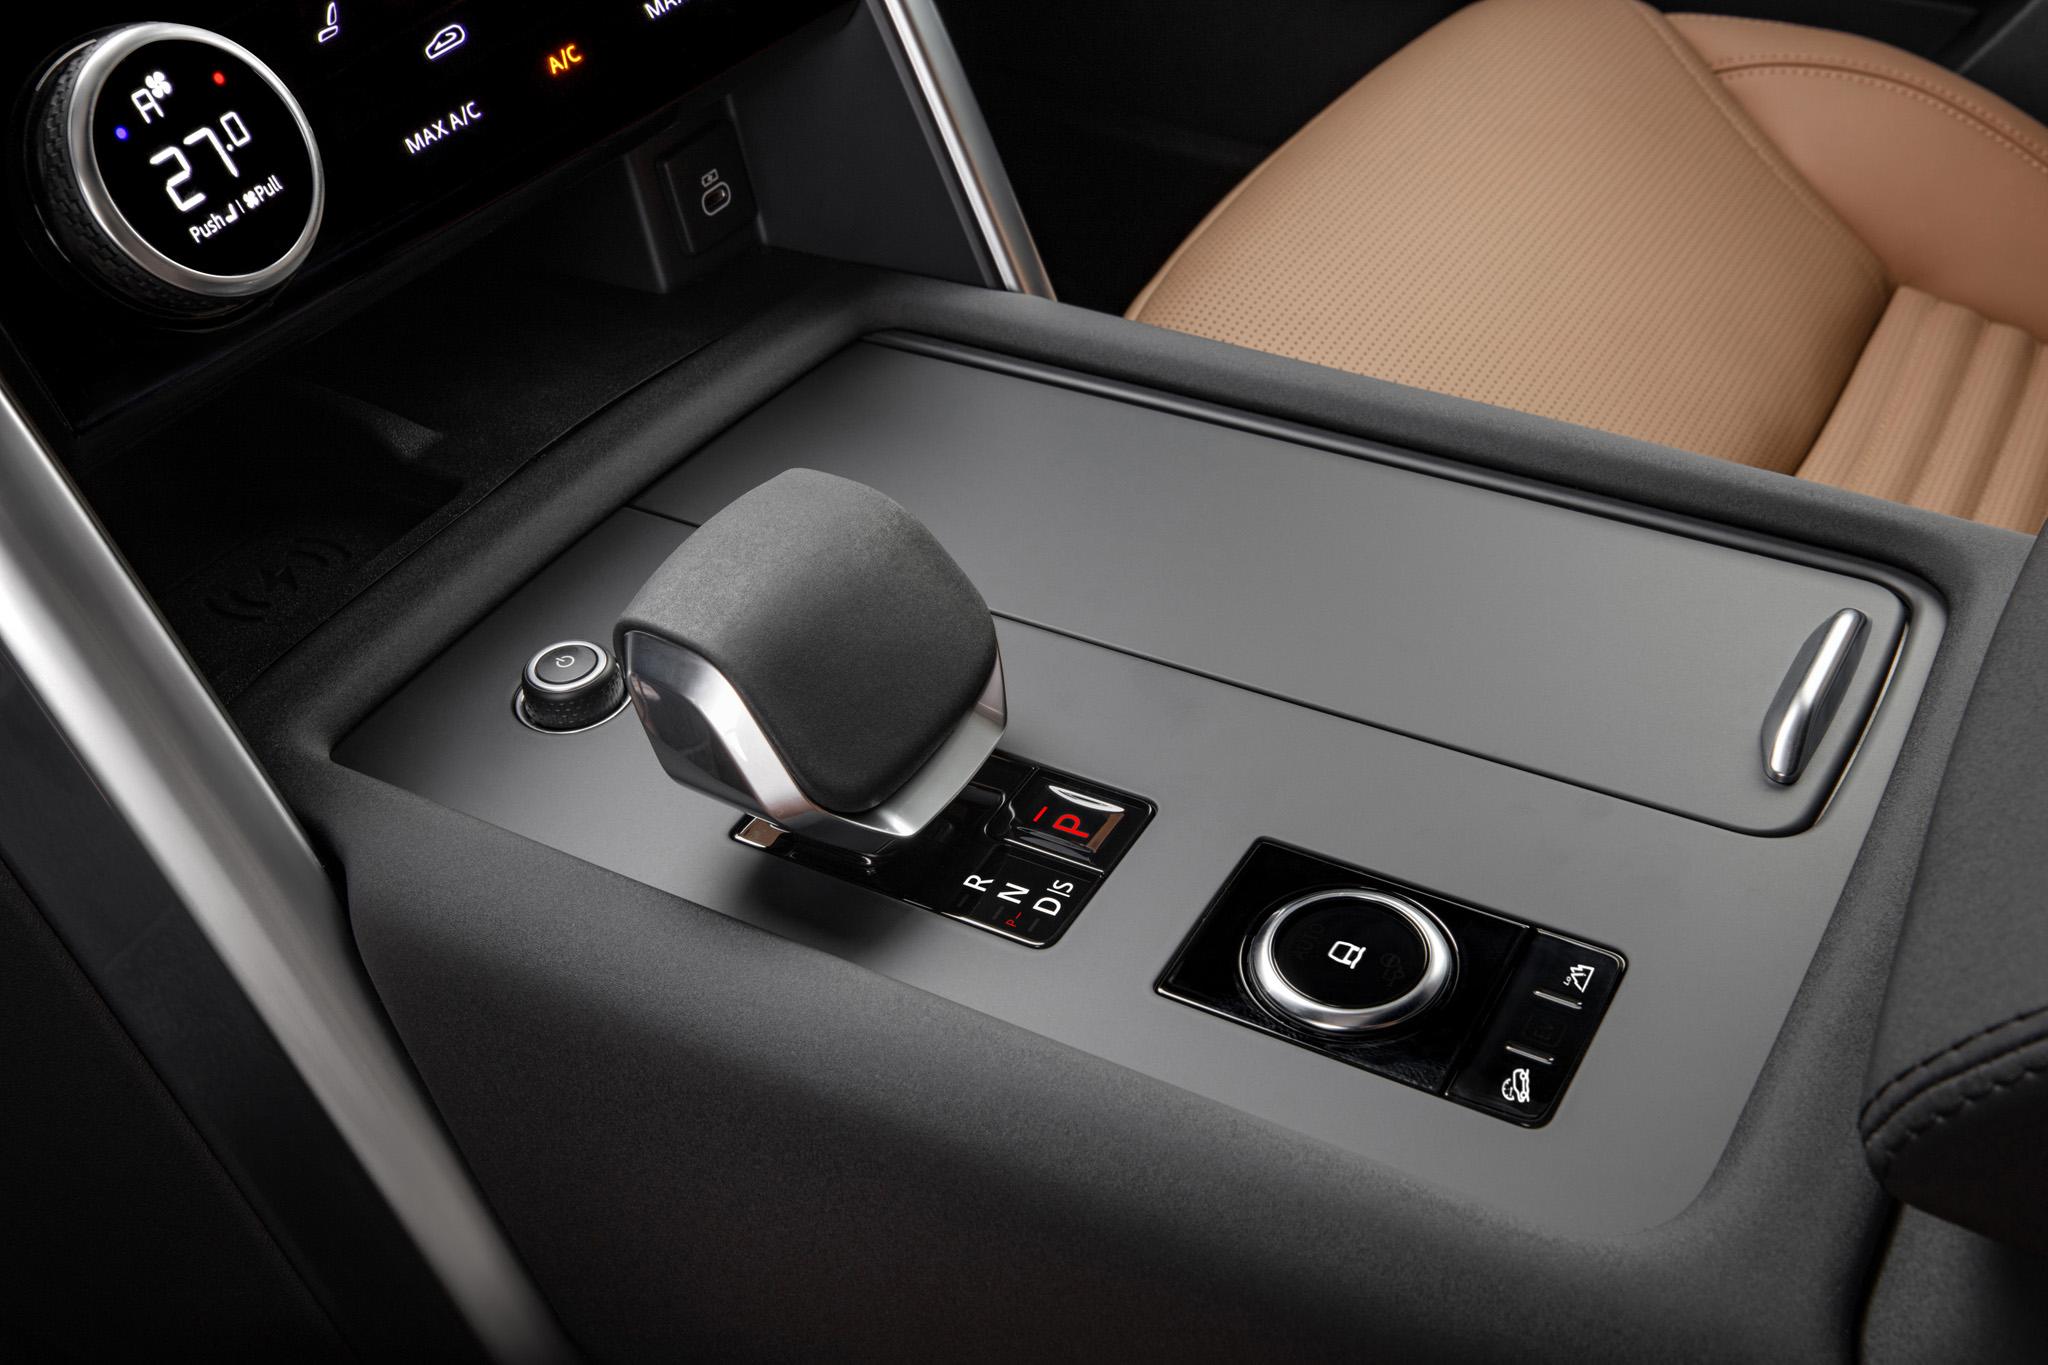 Land-Rover-Discovery-2021-ra-mat-anh-3.jpeg